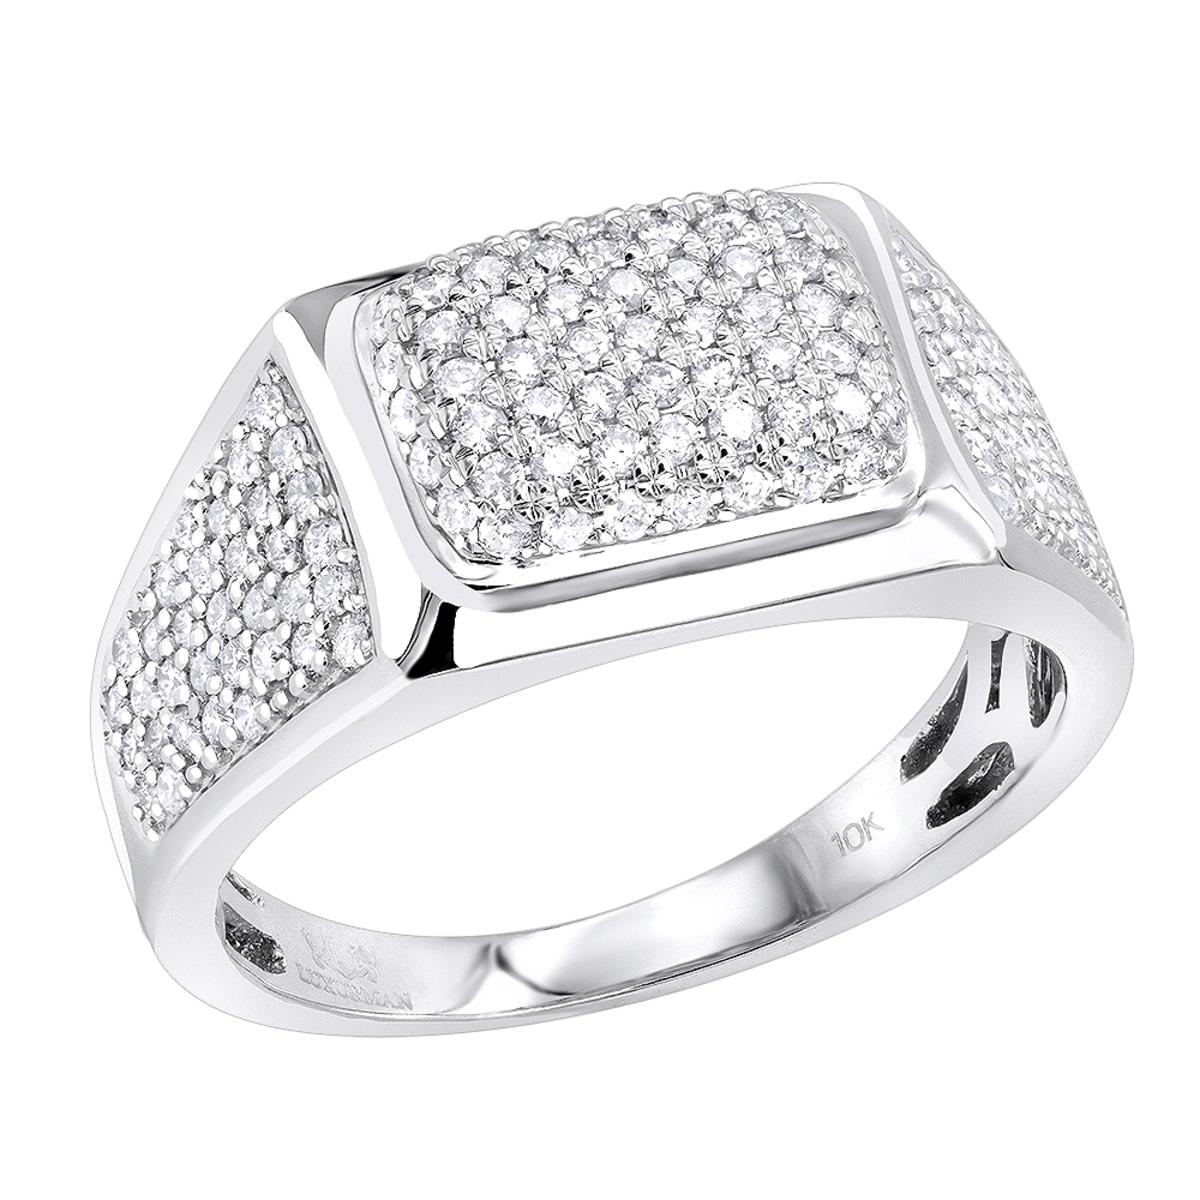 Luxurman Pinky Rings Solid 10K Gold 1 Carat Diamond Ring for Men